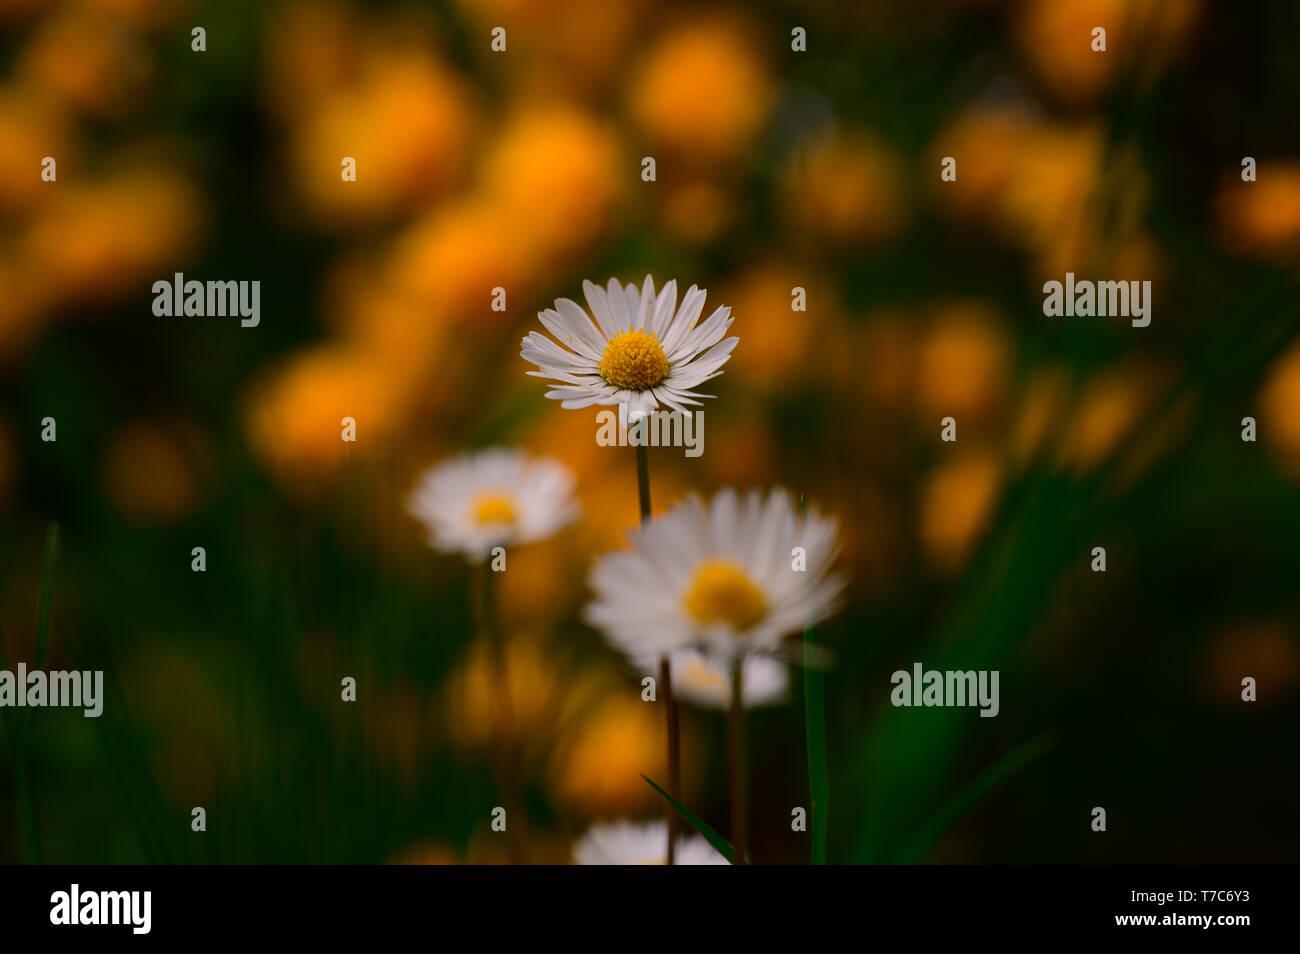 Close up shot daisy flower. Blurred background. - Stock Image